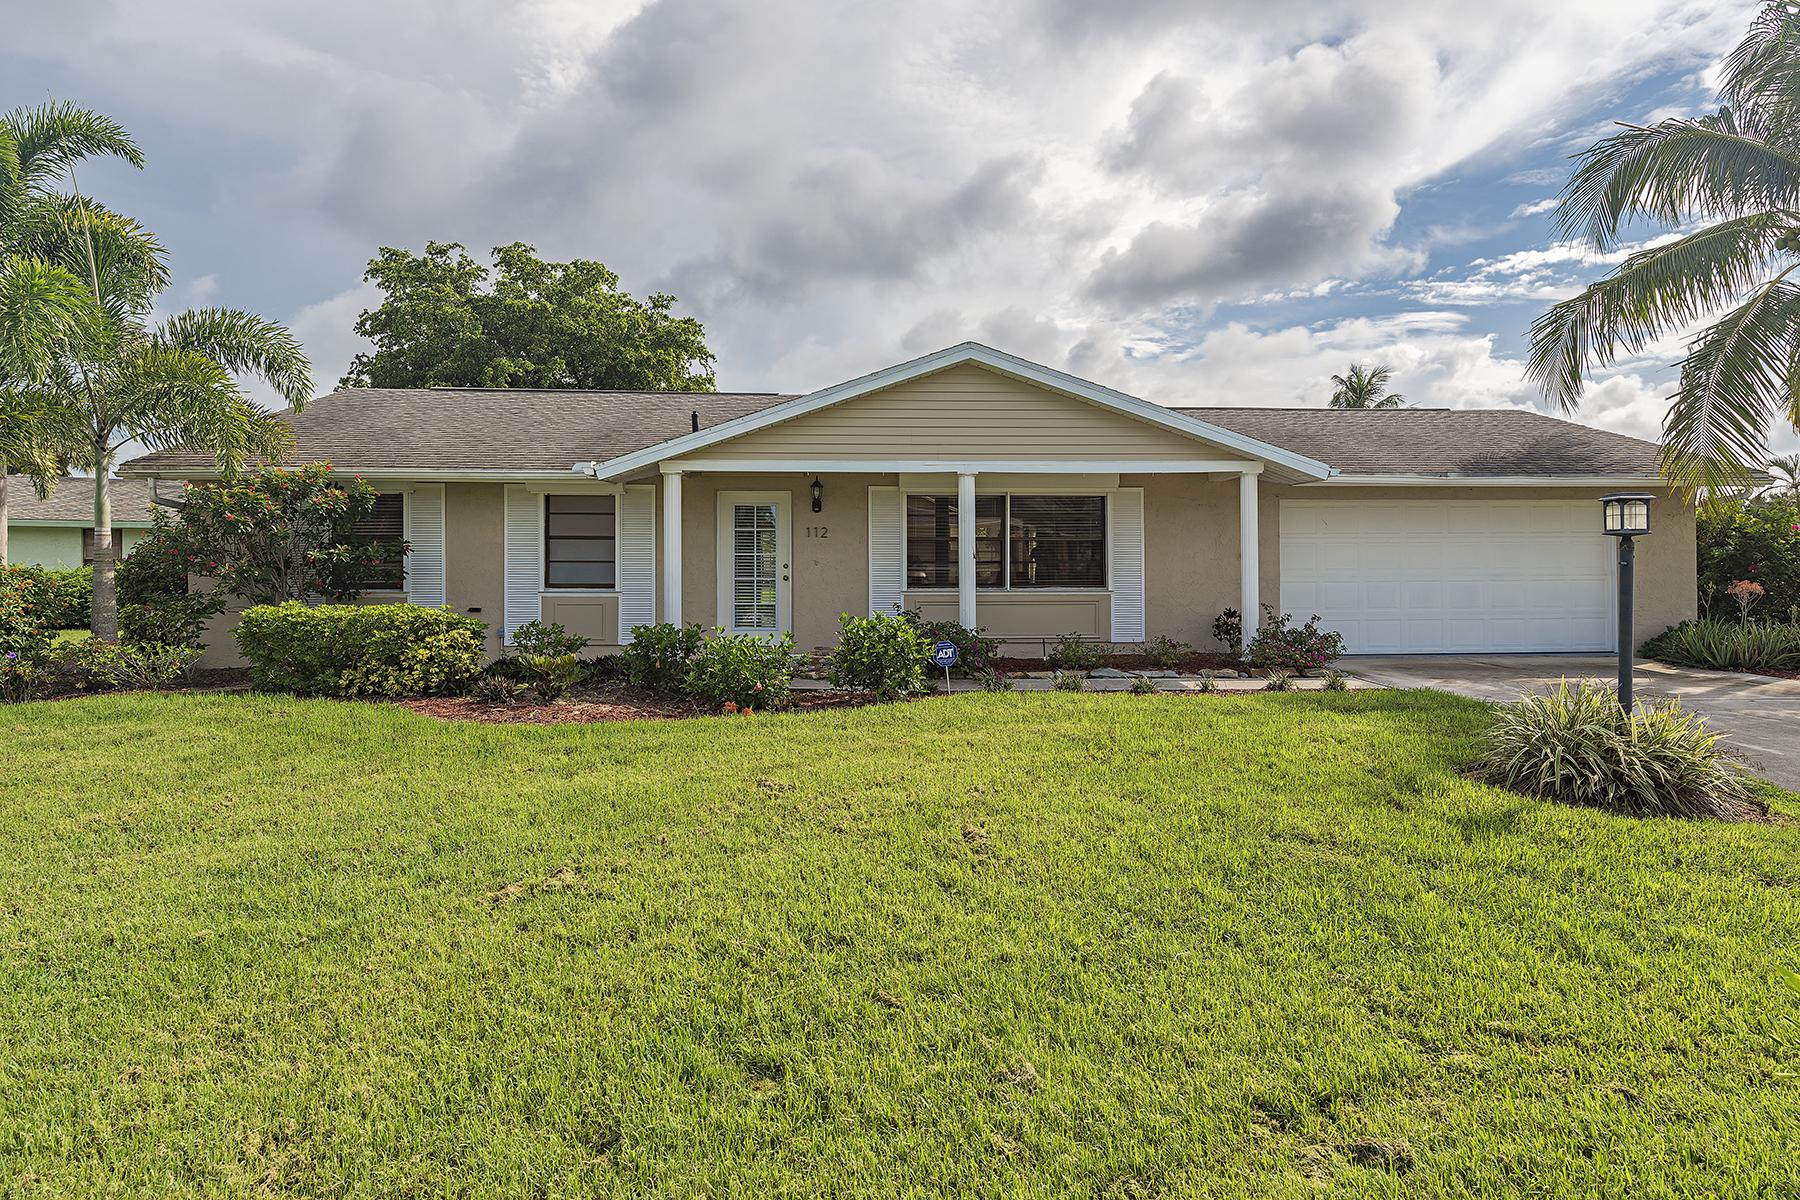 Casa Unifamiliar por un Venta en NAPLES SOUTH - SHENANDOAH 112 Blue Ridge Dr Naples, Florida, 34112 Estados Unidos